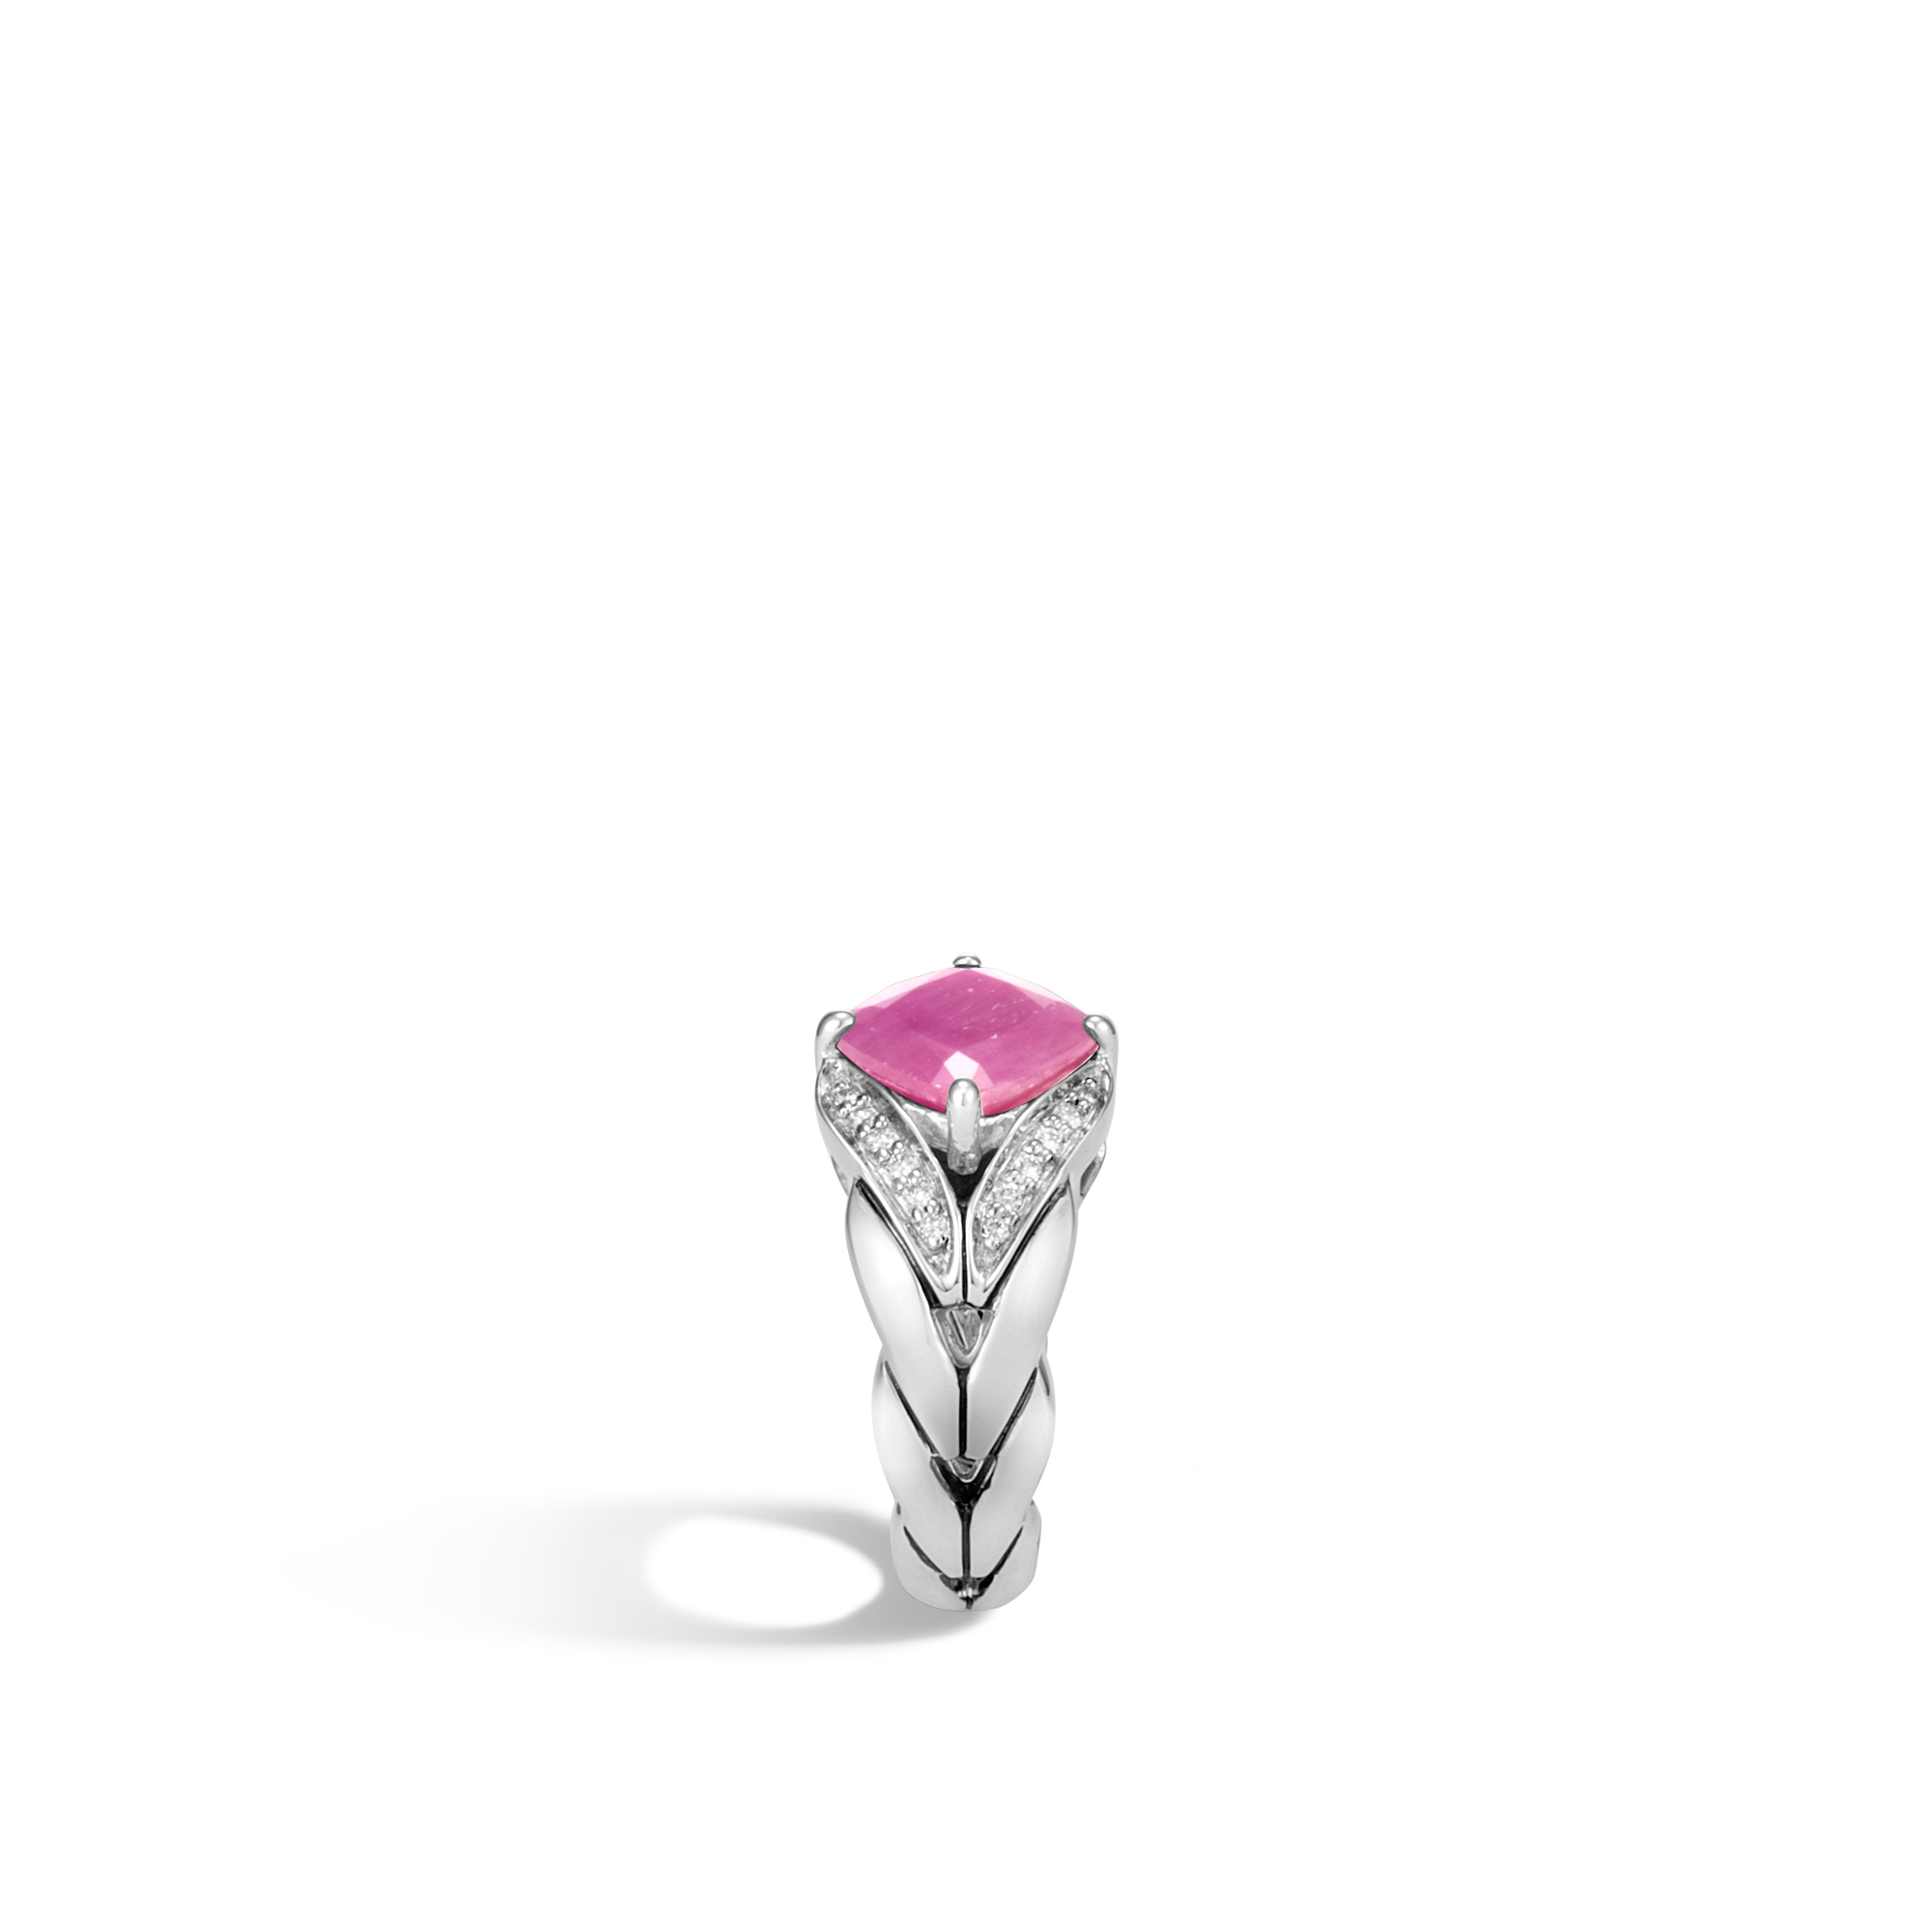 Modern Chain Magic Cut Ring, Silver, 9MM Gemstone, Diamonds, Pink Sheen Sapphire, large